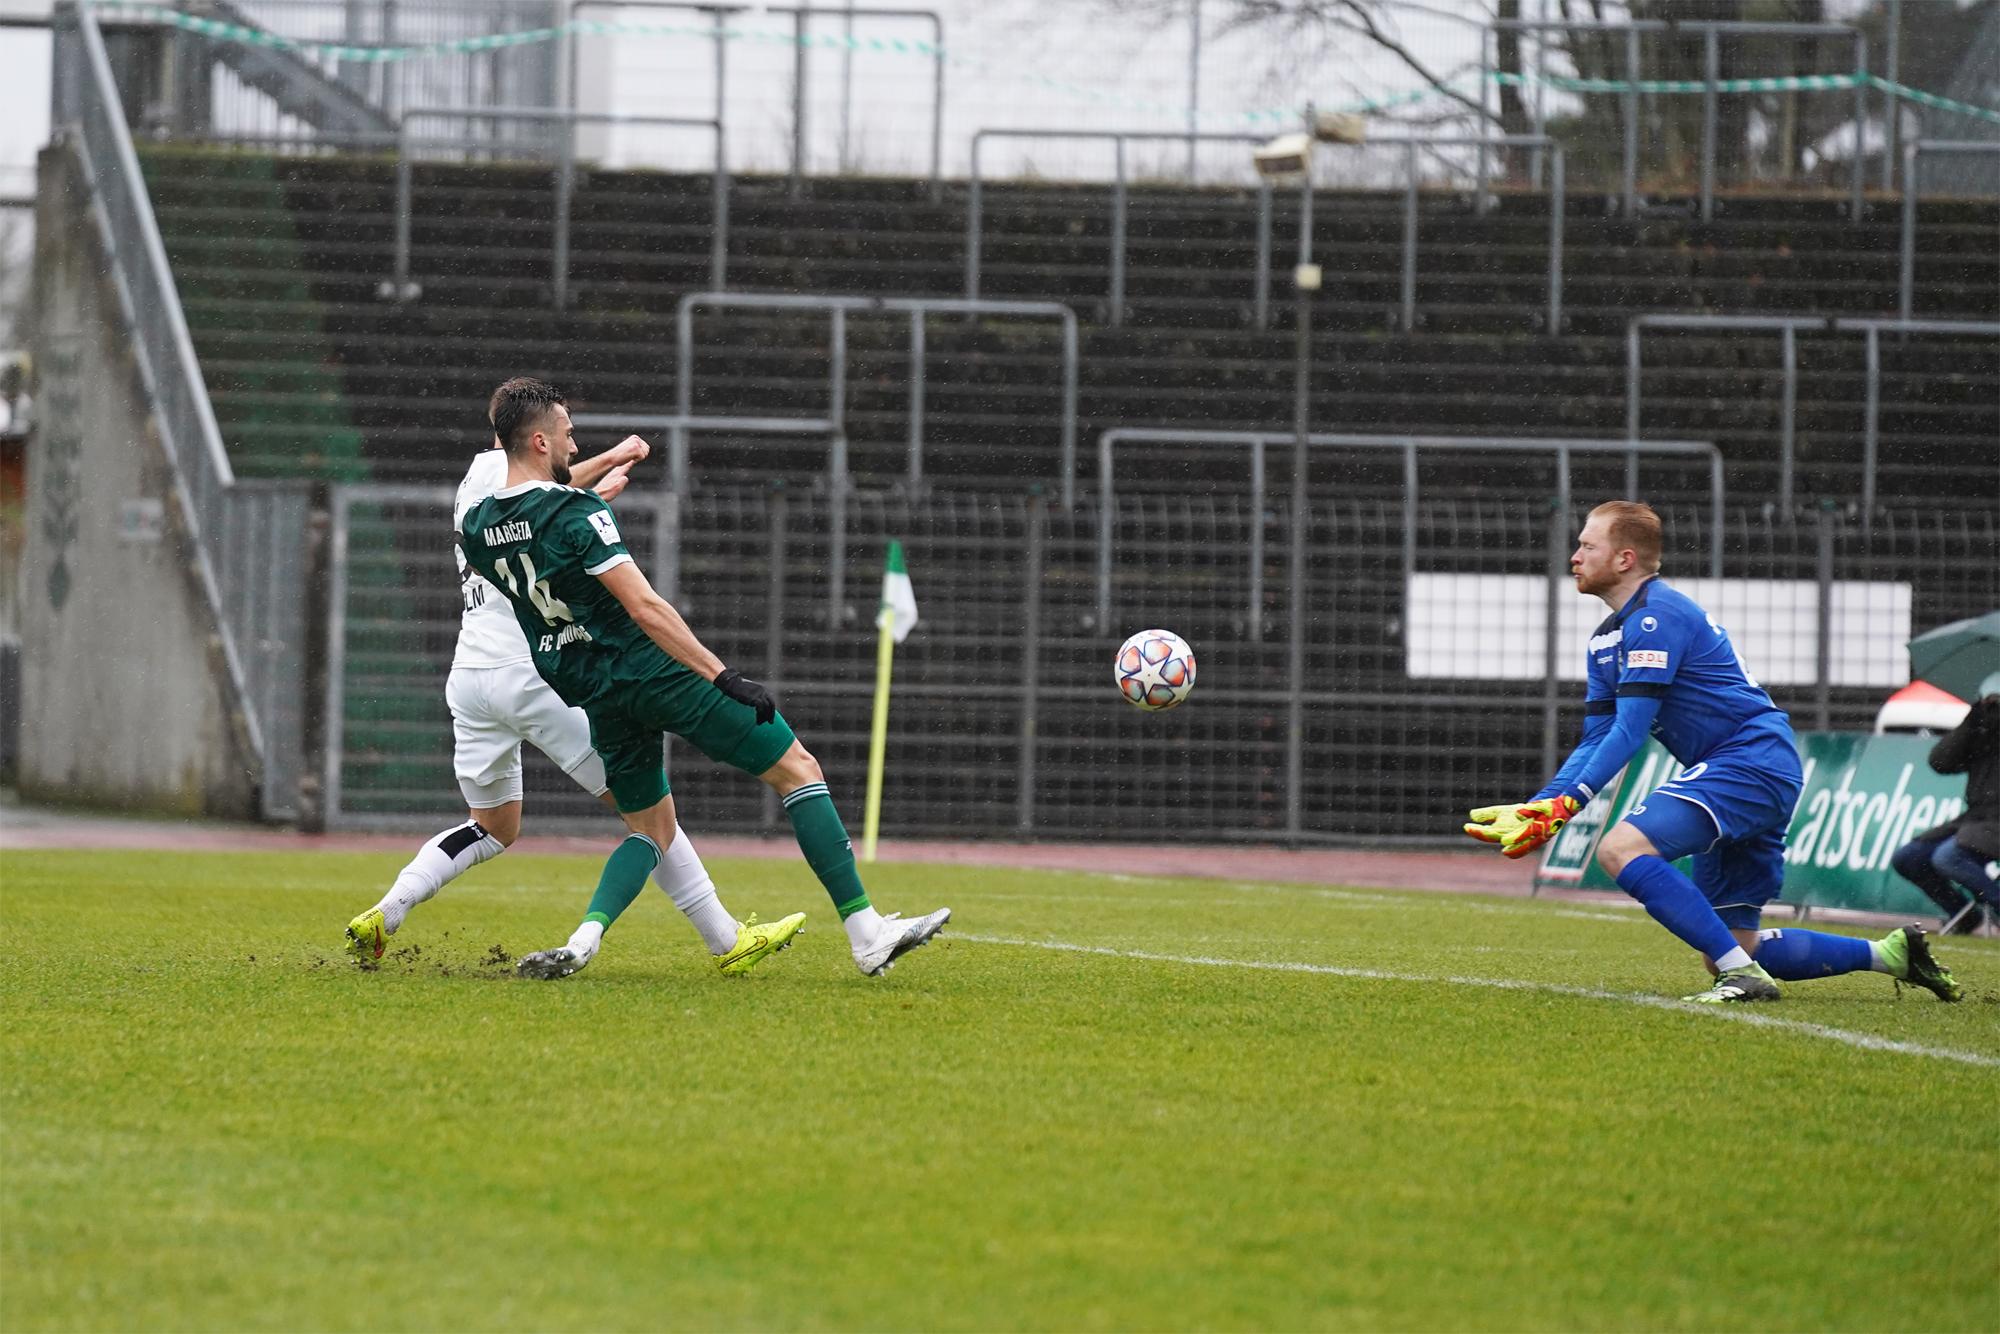 30.01.2021 | Saison 2020/21 | FC 08 Homburg | SSV Ulm 1846 Fußball